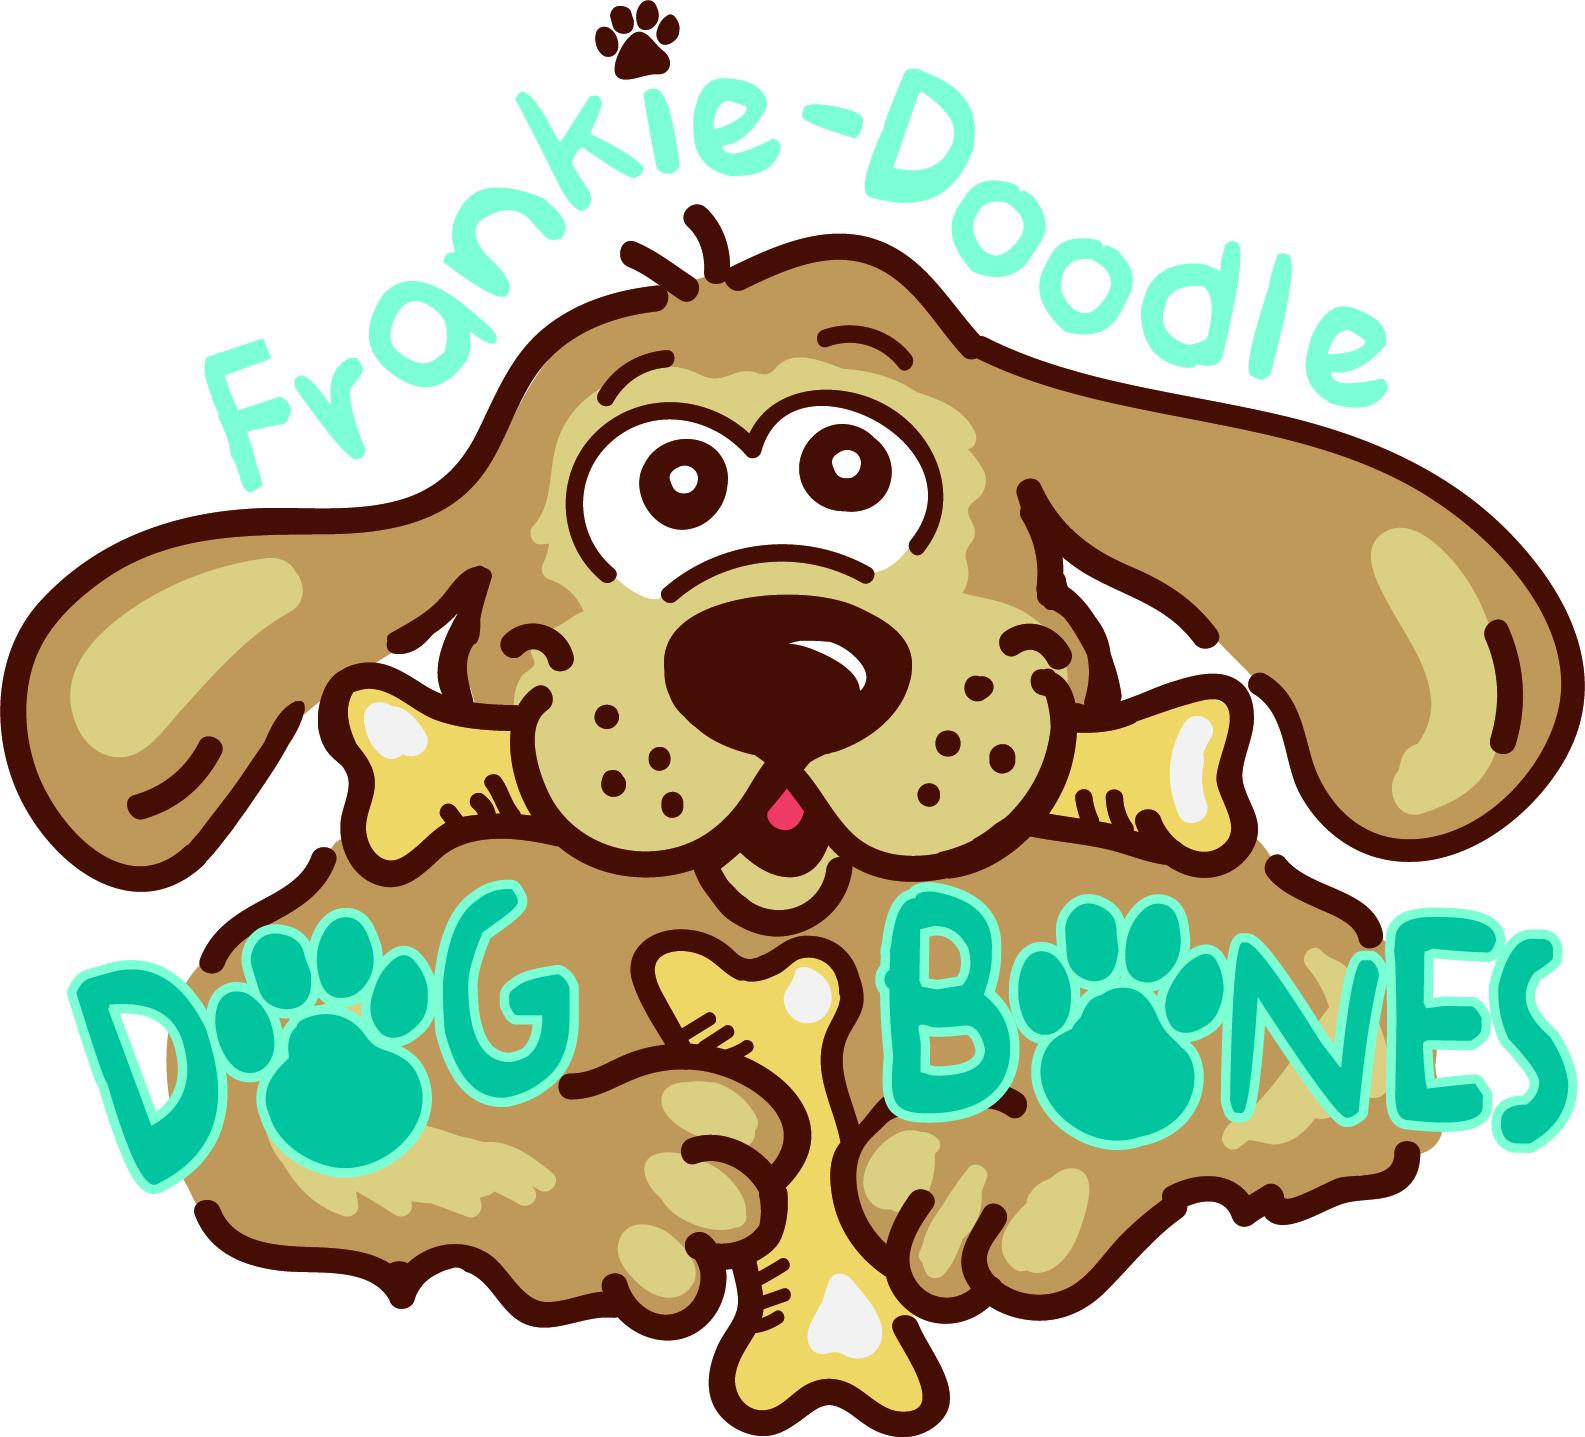 frankie-doodle_logo.jpg